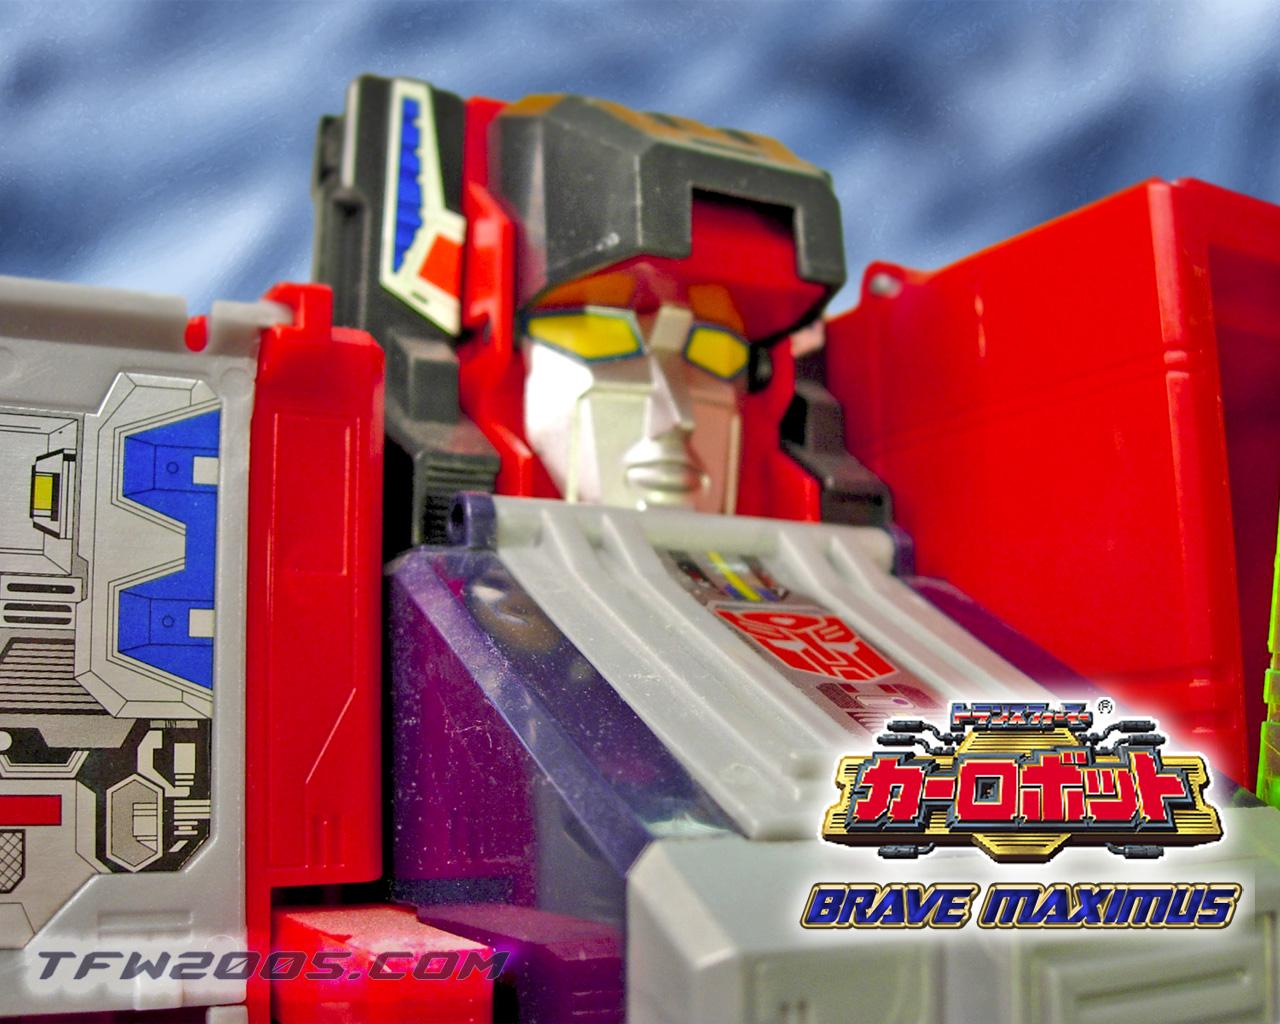 BraveMax1280